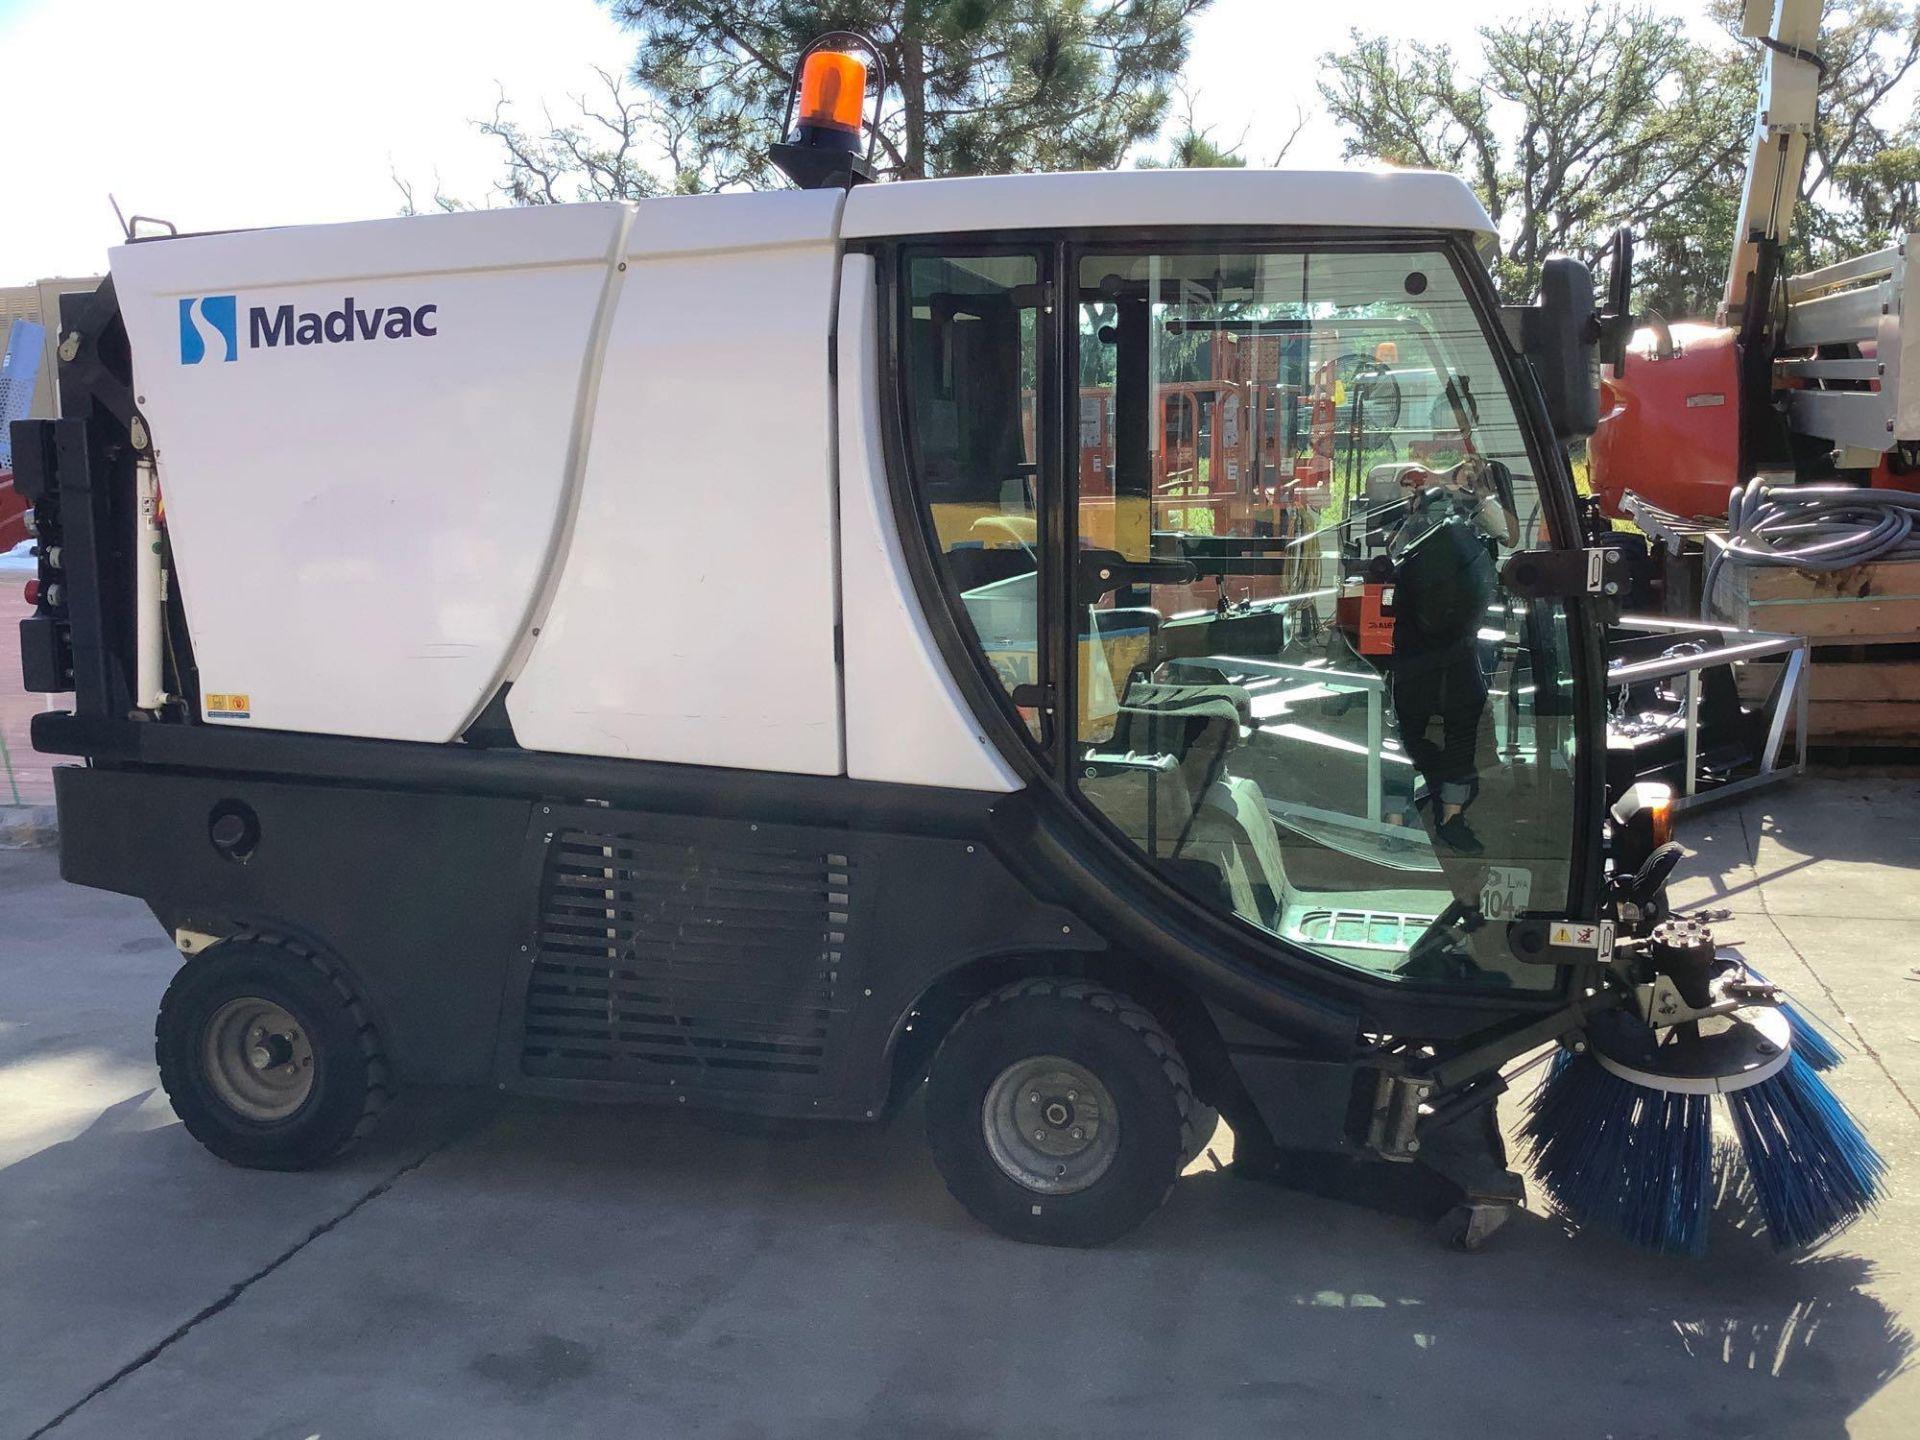 MADVAC COMPACT SWEEPER MODEL LS100 ,ENCLOSED CAB,BACK UP CAMERA, A/C AIR, EXTRA KEY - Image 4 of 15